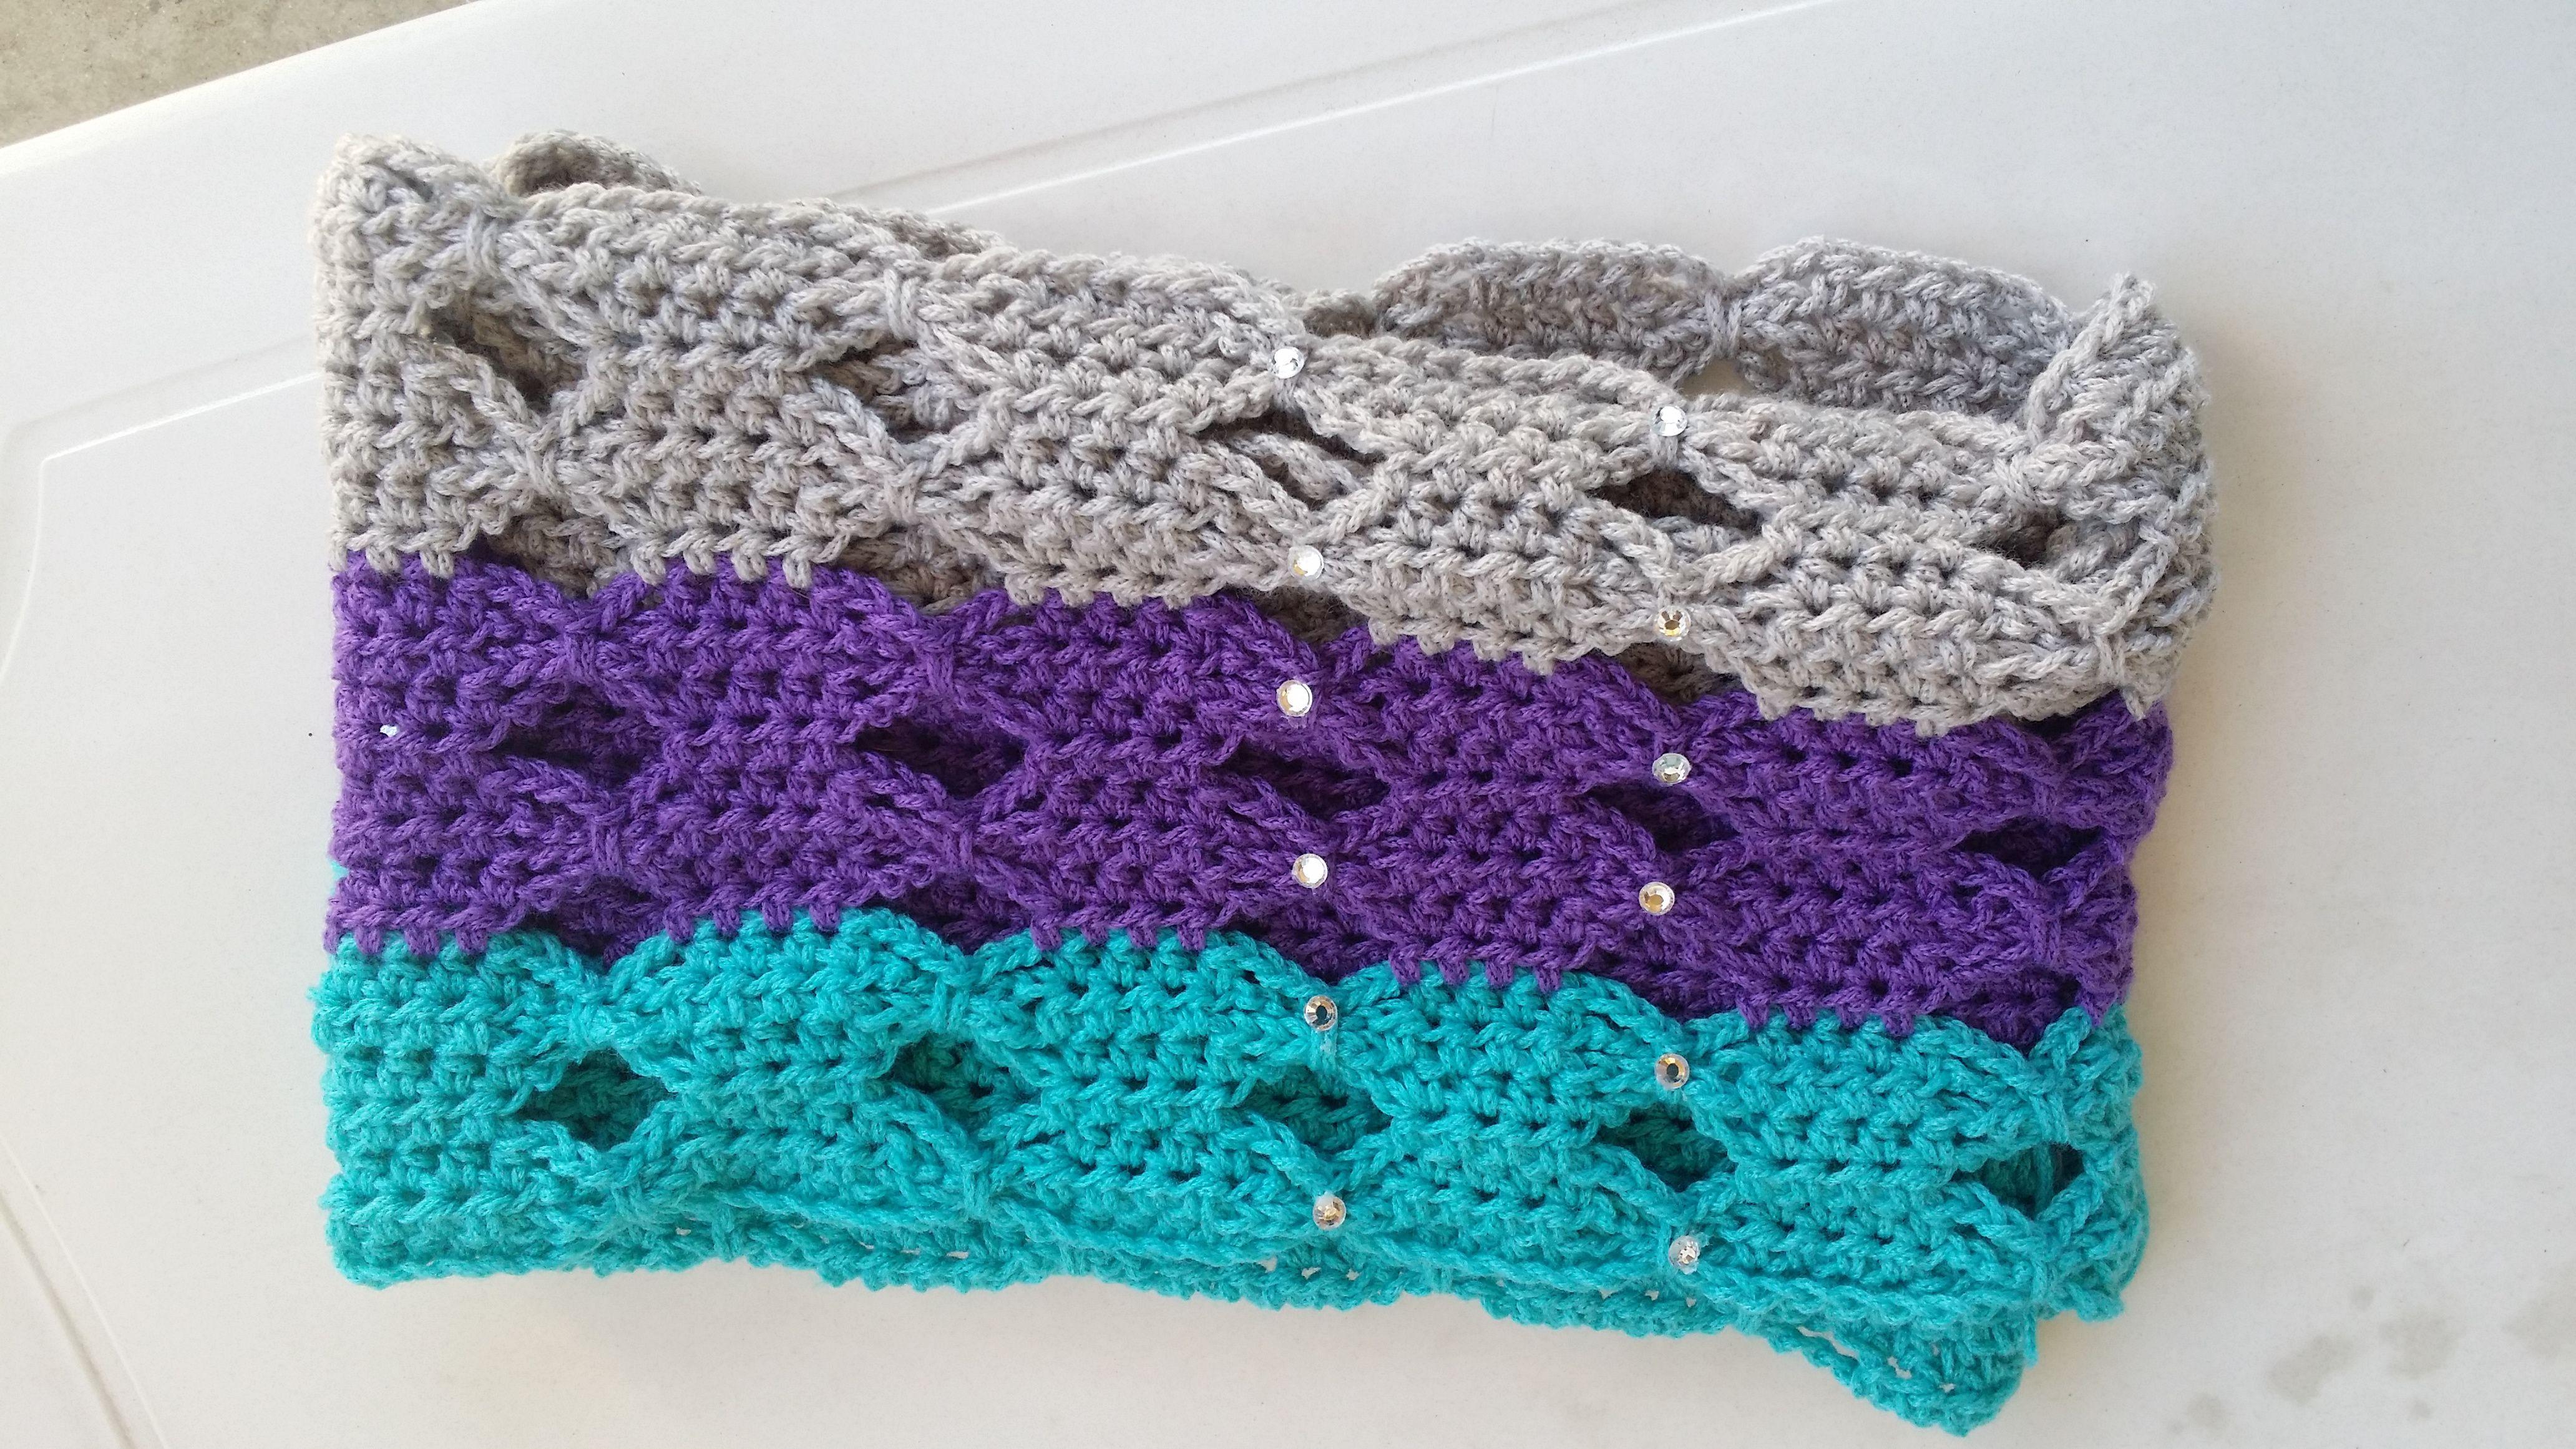 crochet cowl | Crochet bufandas y cuellos | Pinterest | Crochet bufanda